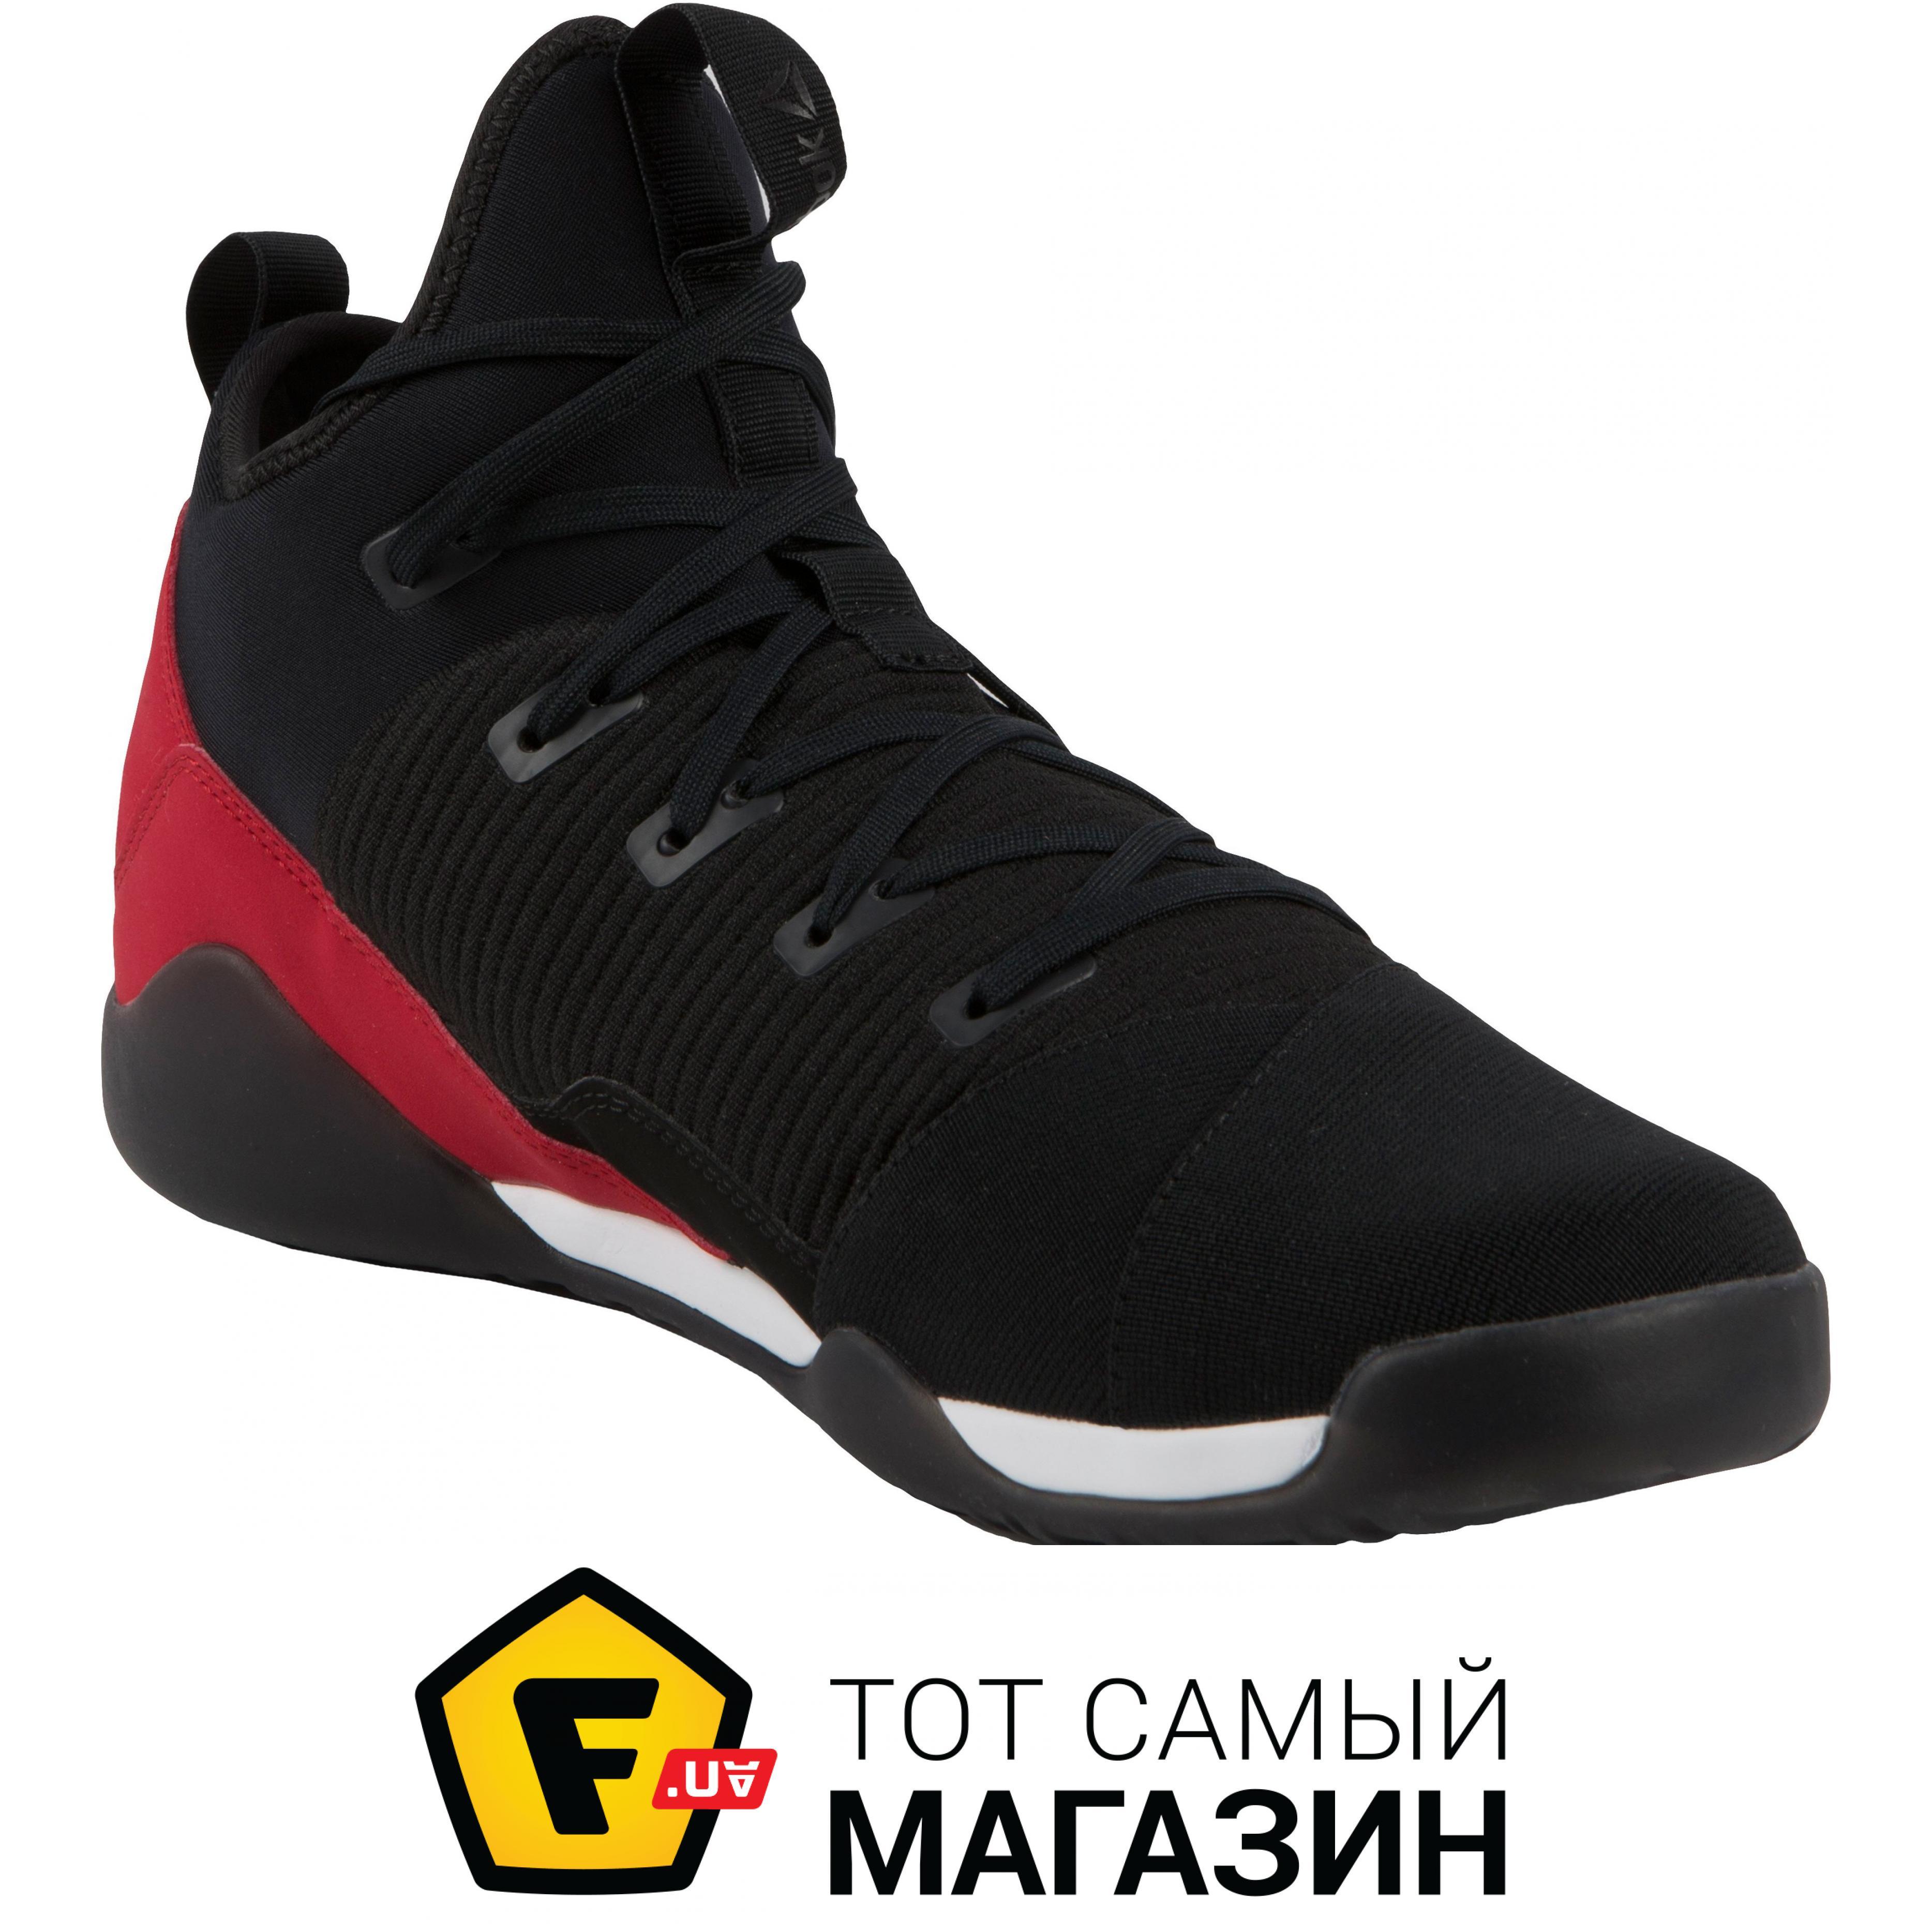 5e659dc588aa7d Reebok Combat Noble Mid Boxers 43, черный/красный (REBD2) Материал верха: